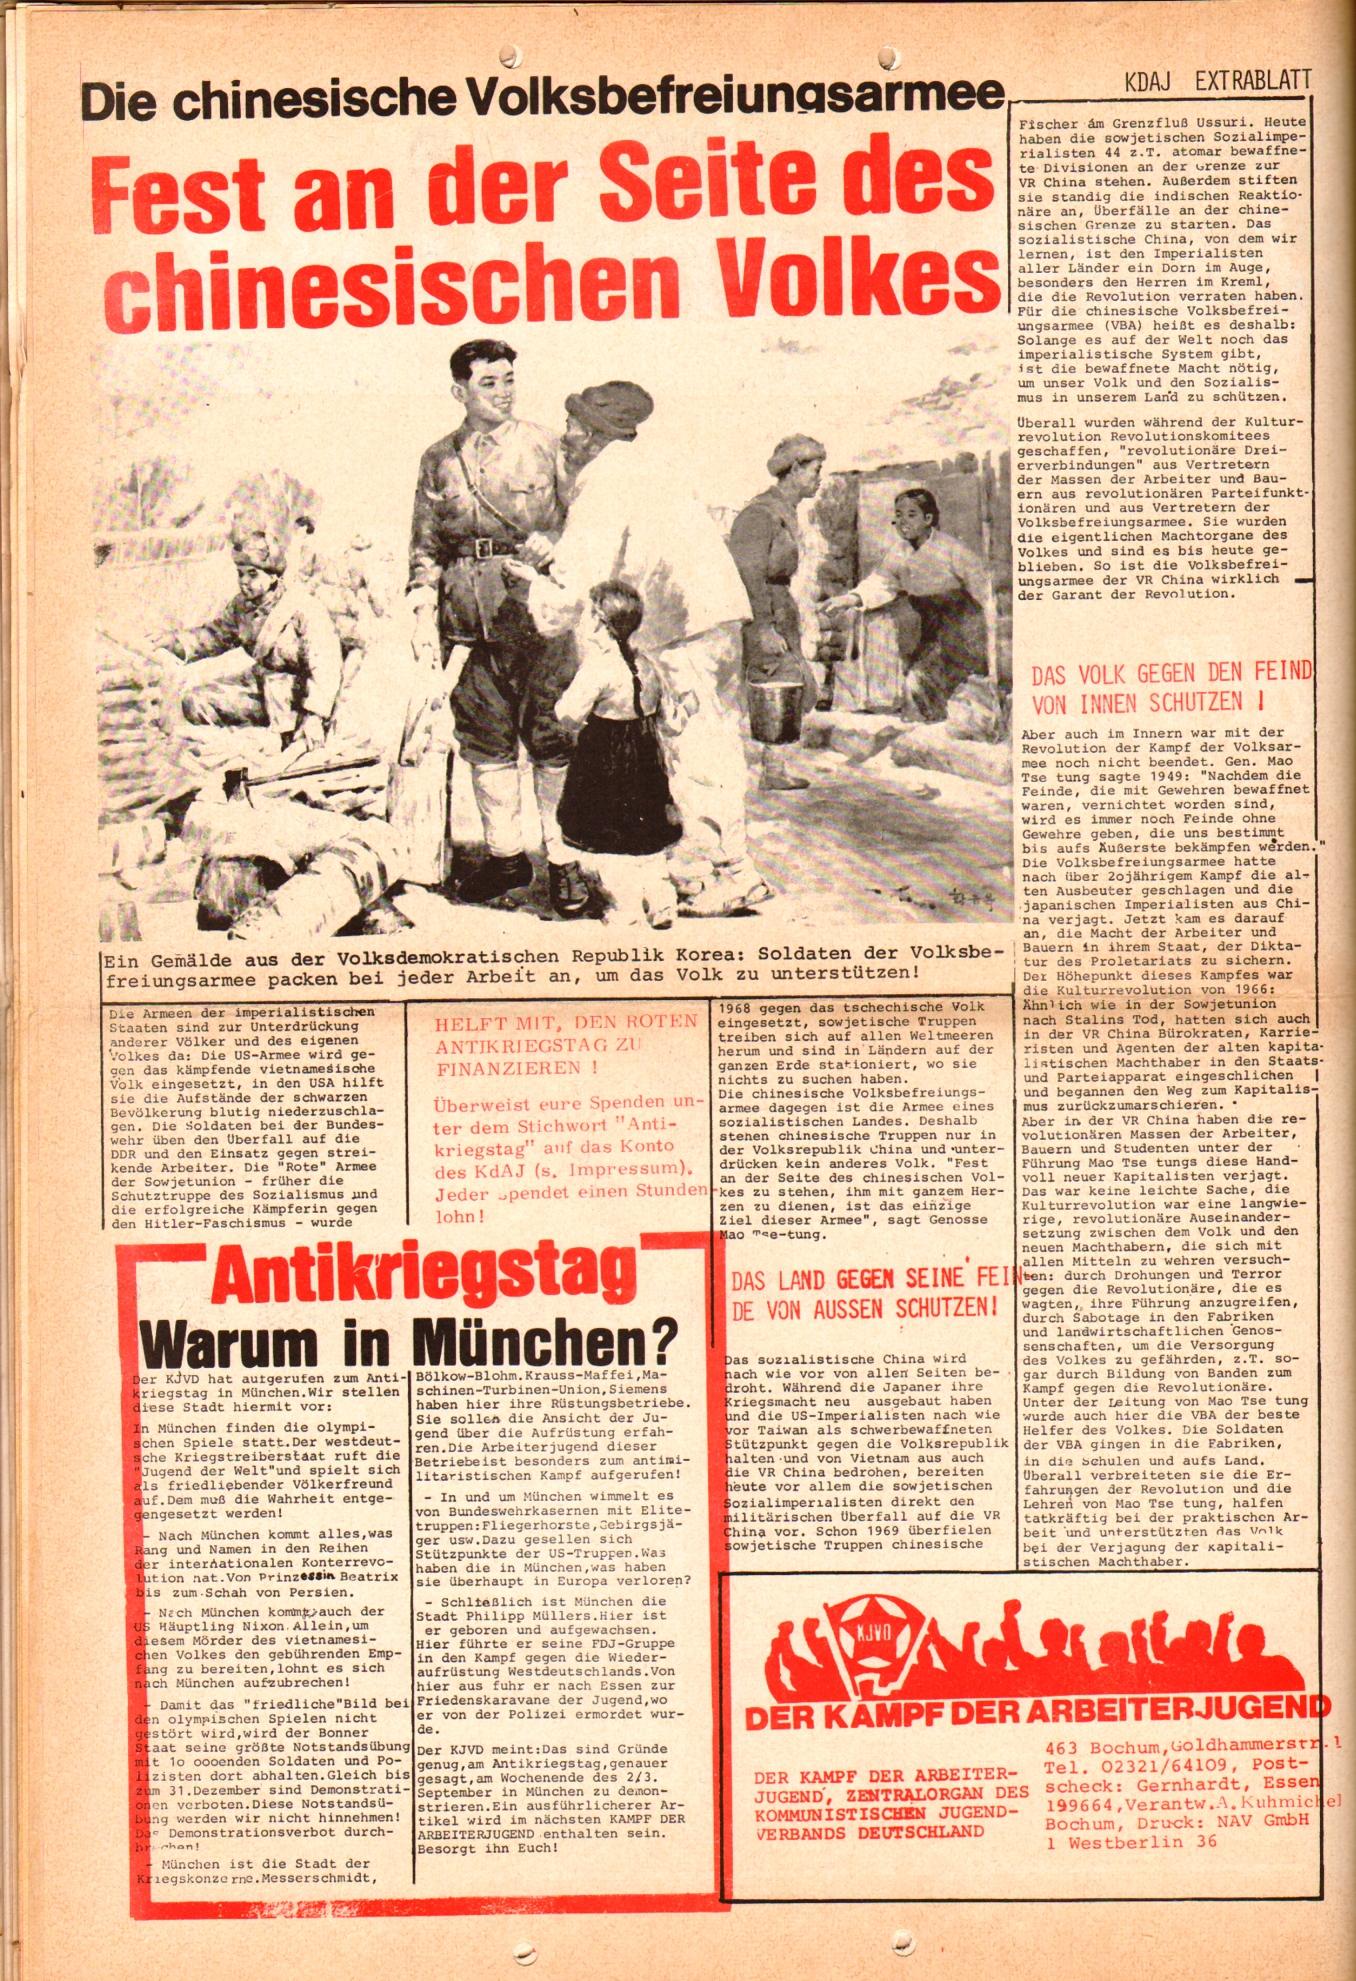 KDAJ, 3. Jg., Juli 1972, Extrablatt, Seite 4